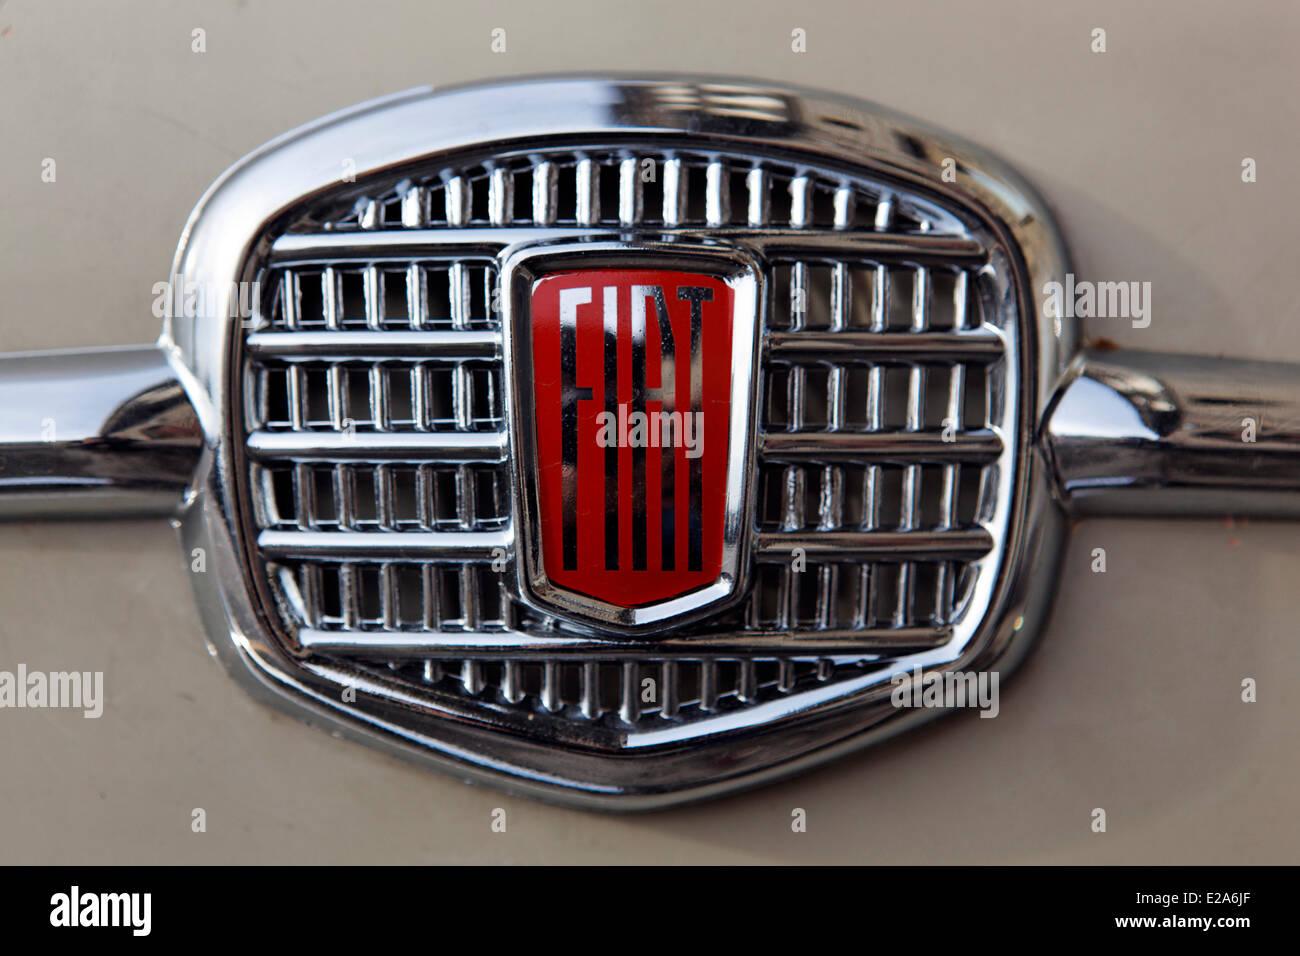 Italy, Tuscany, Florence, radiator grill of Fiat - Stock Image